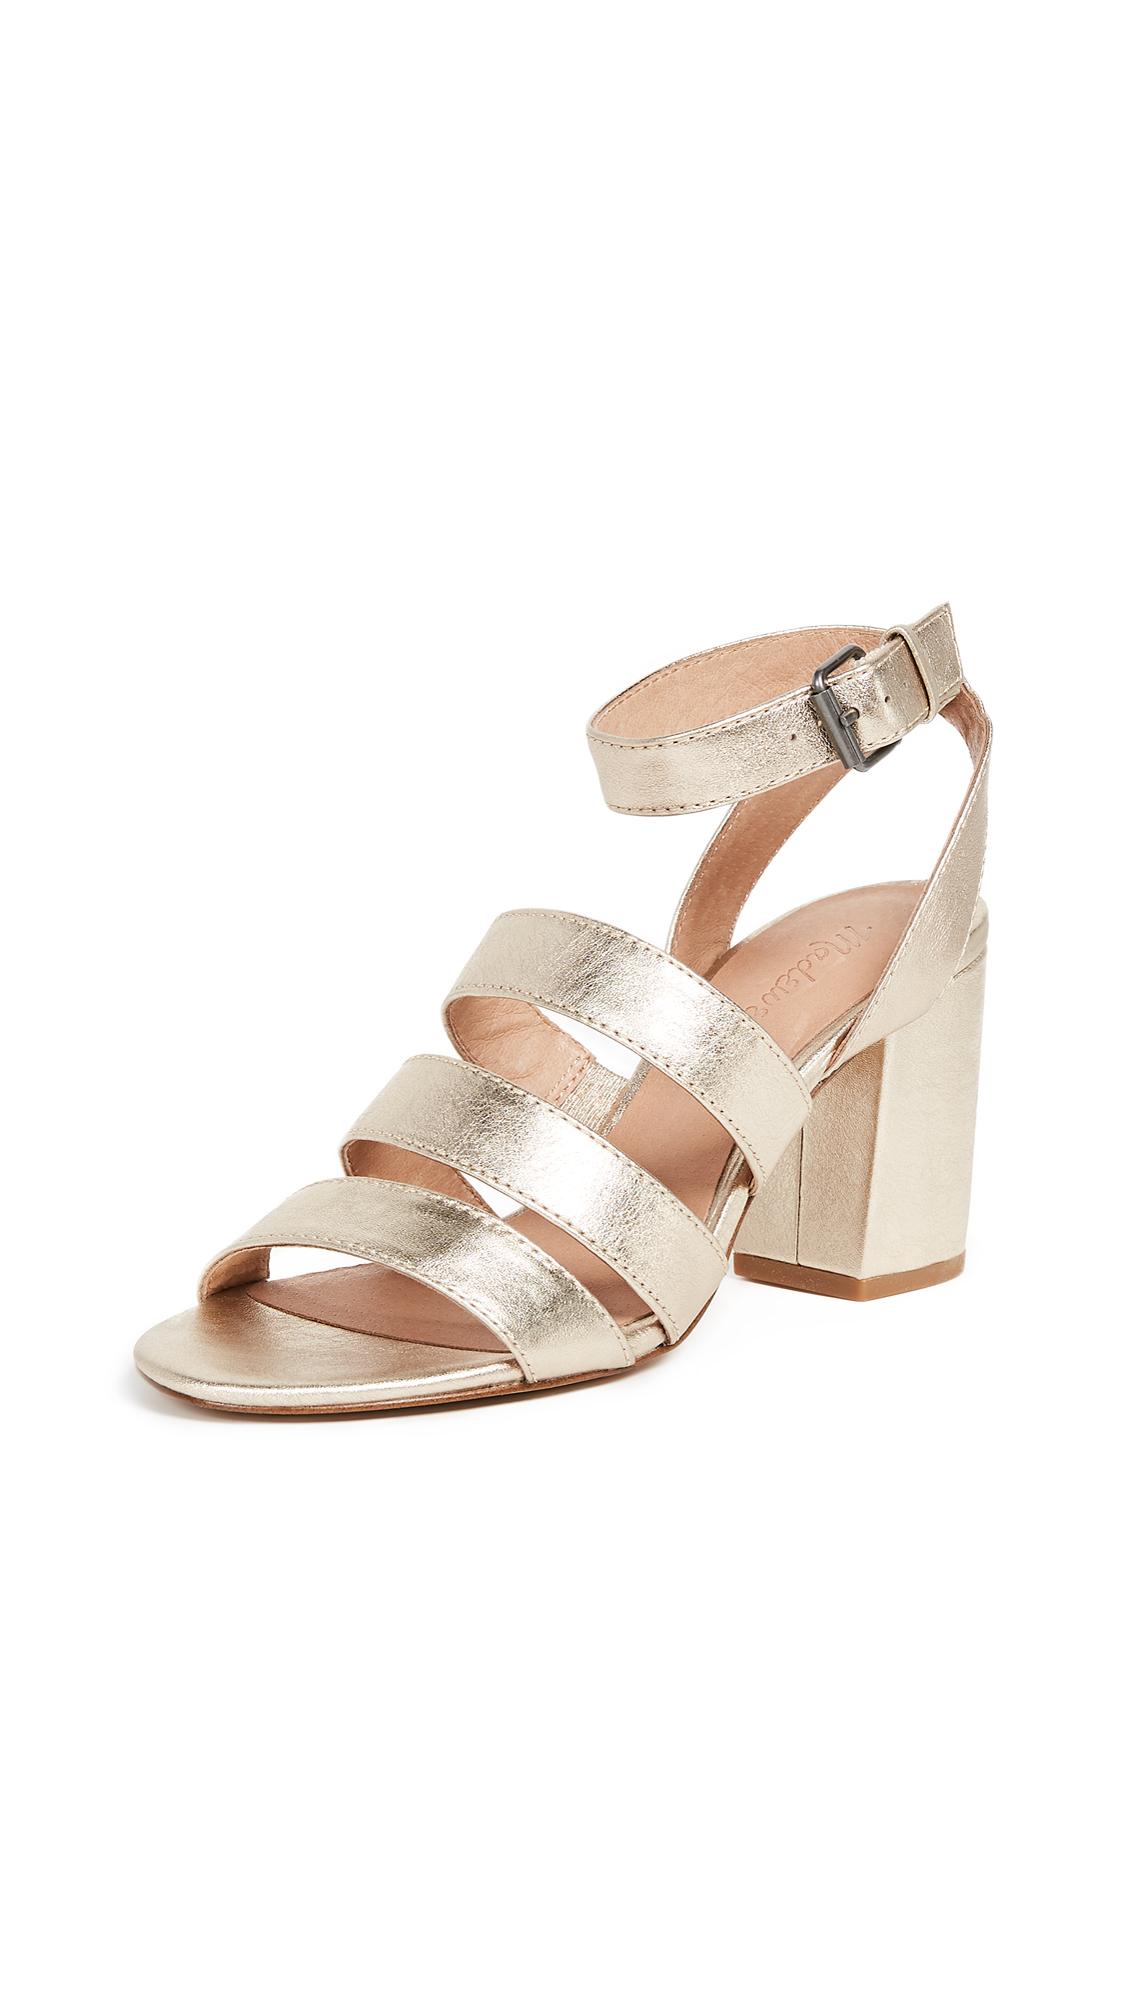 Madewell Bistra 3 Strap Sandal - White Gold